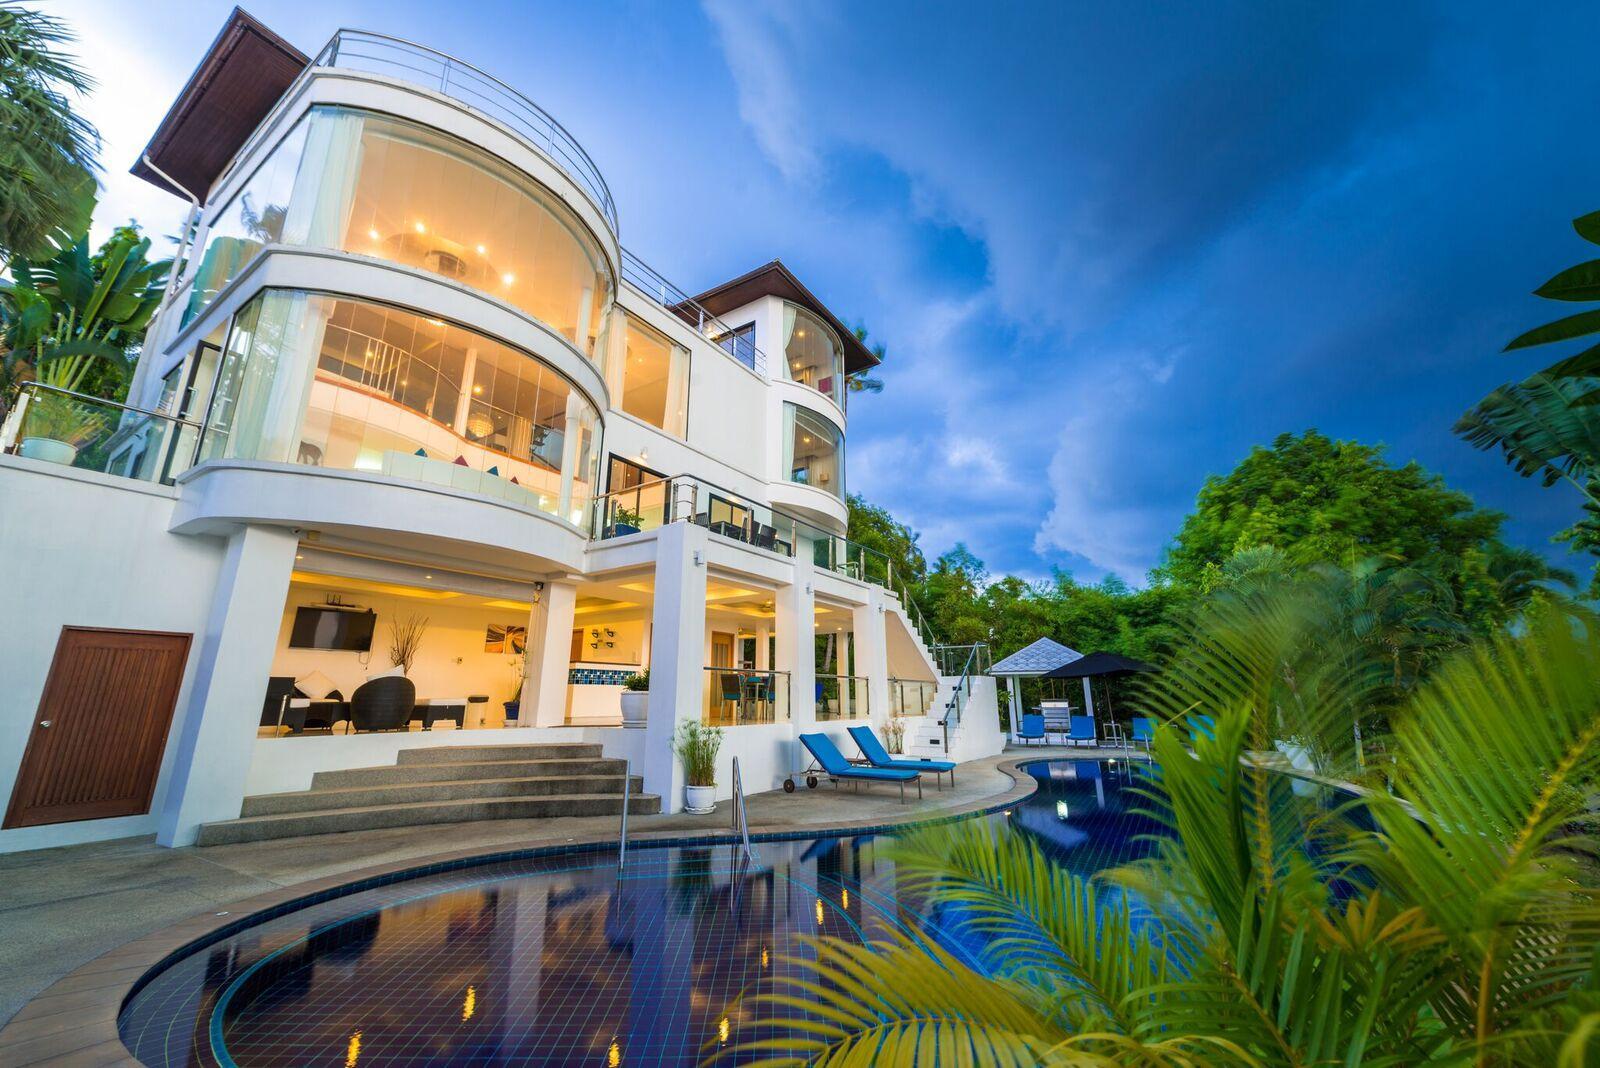 Villa White Stone With Sea View And Private Pool